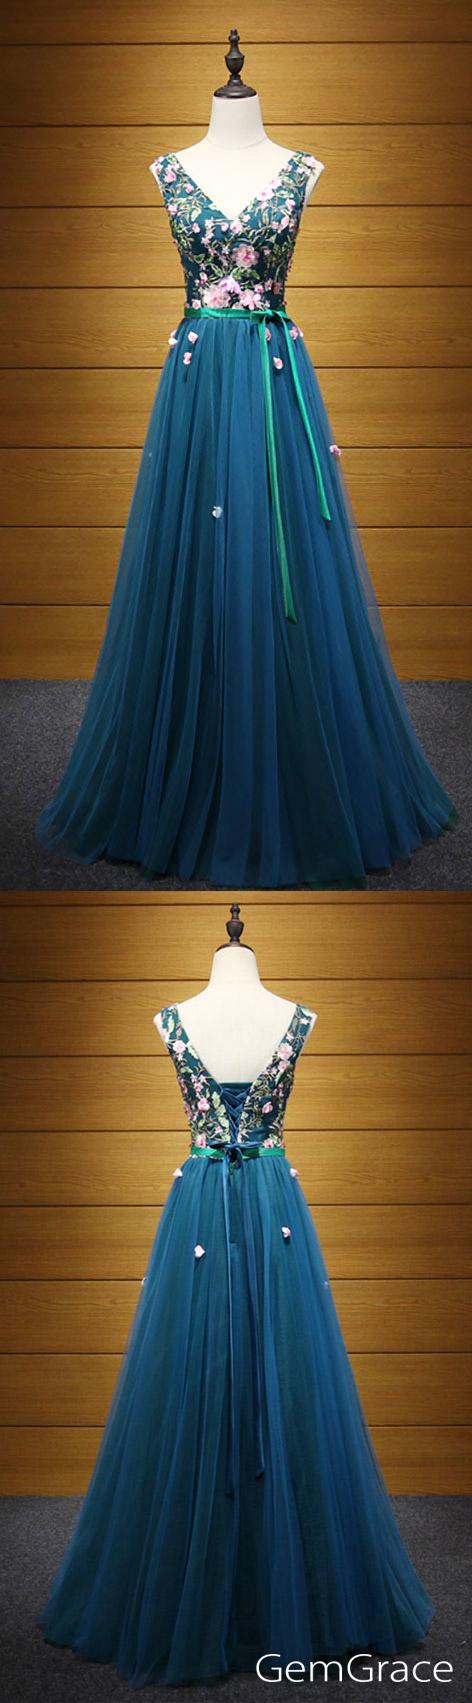 Exquisite aline vneck floorlength tulle prom dress with